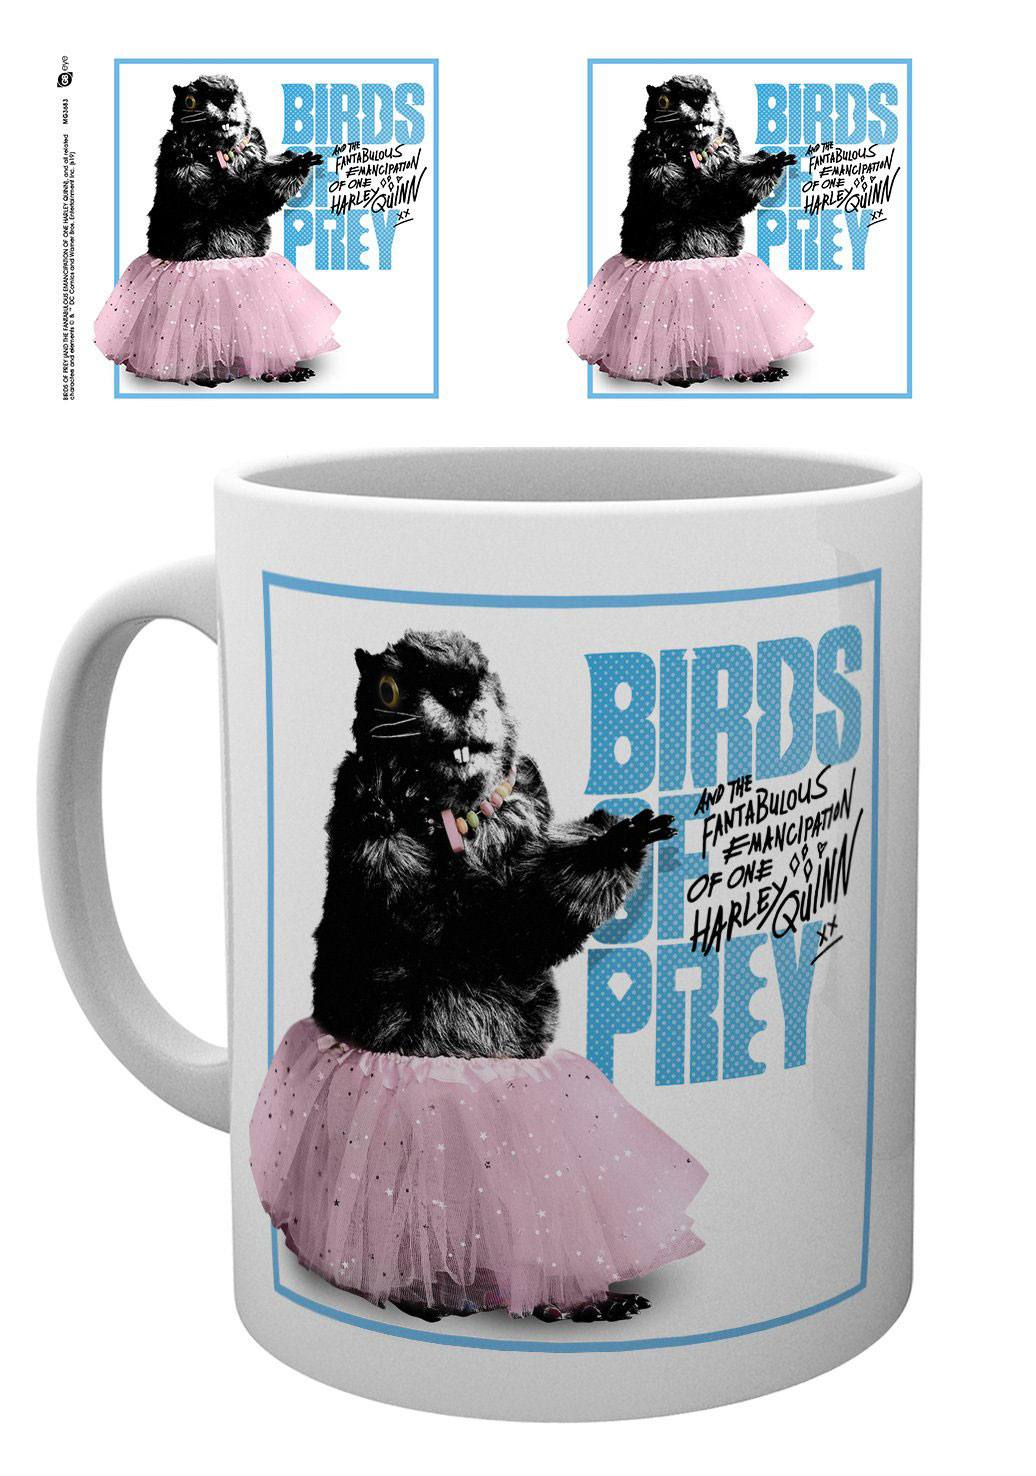 Birds of Prey Mug Tutu